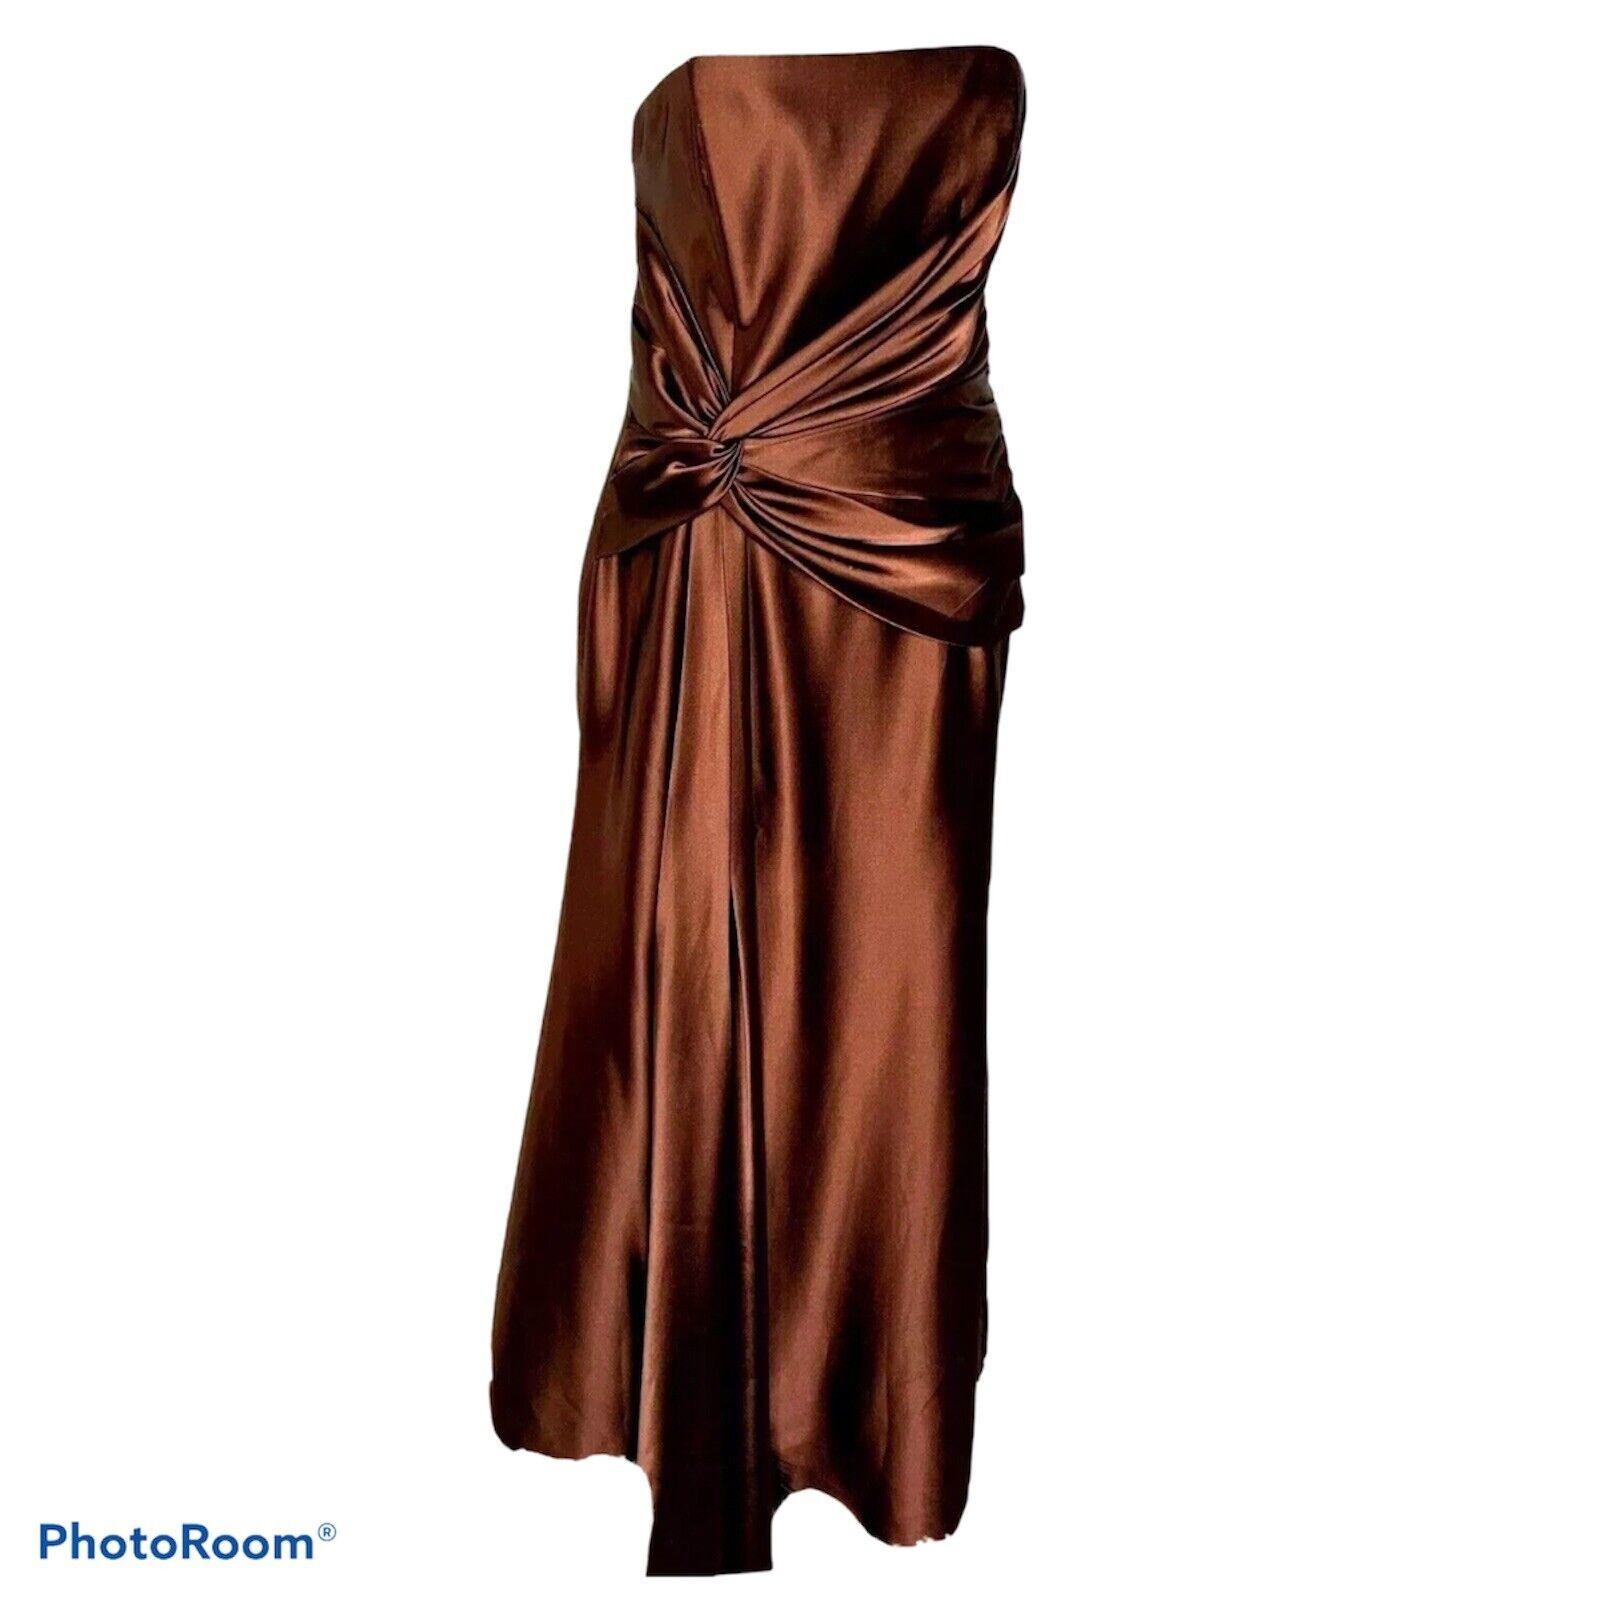 Jessica McClintock Bridal Cocktail Brown Strapless Satin Maxi Dress Size 12